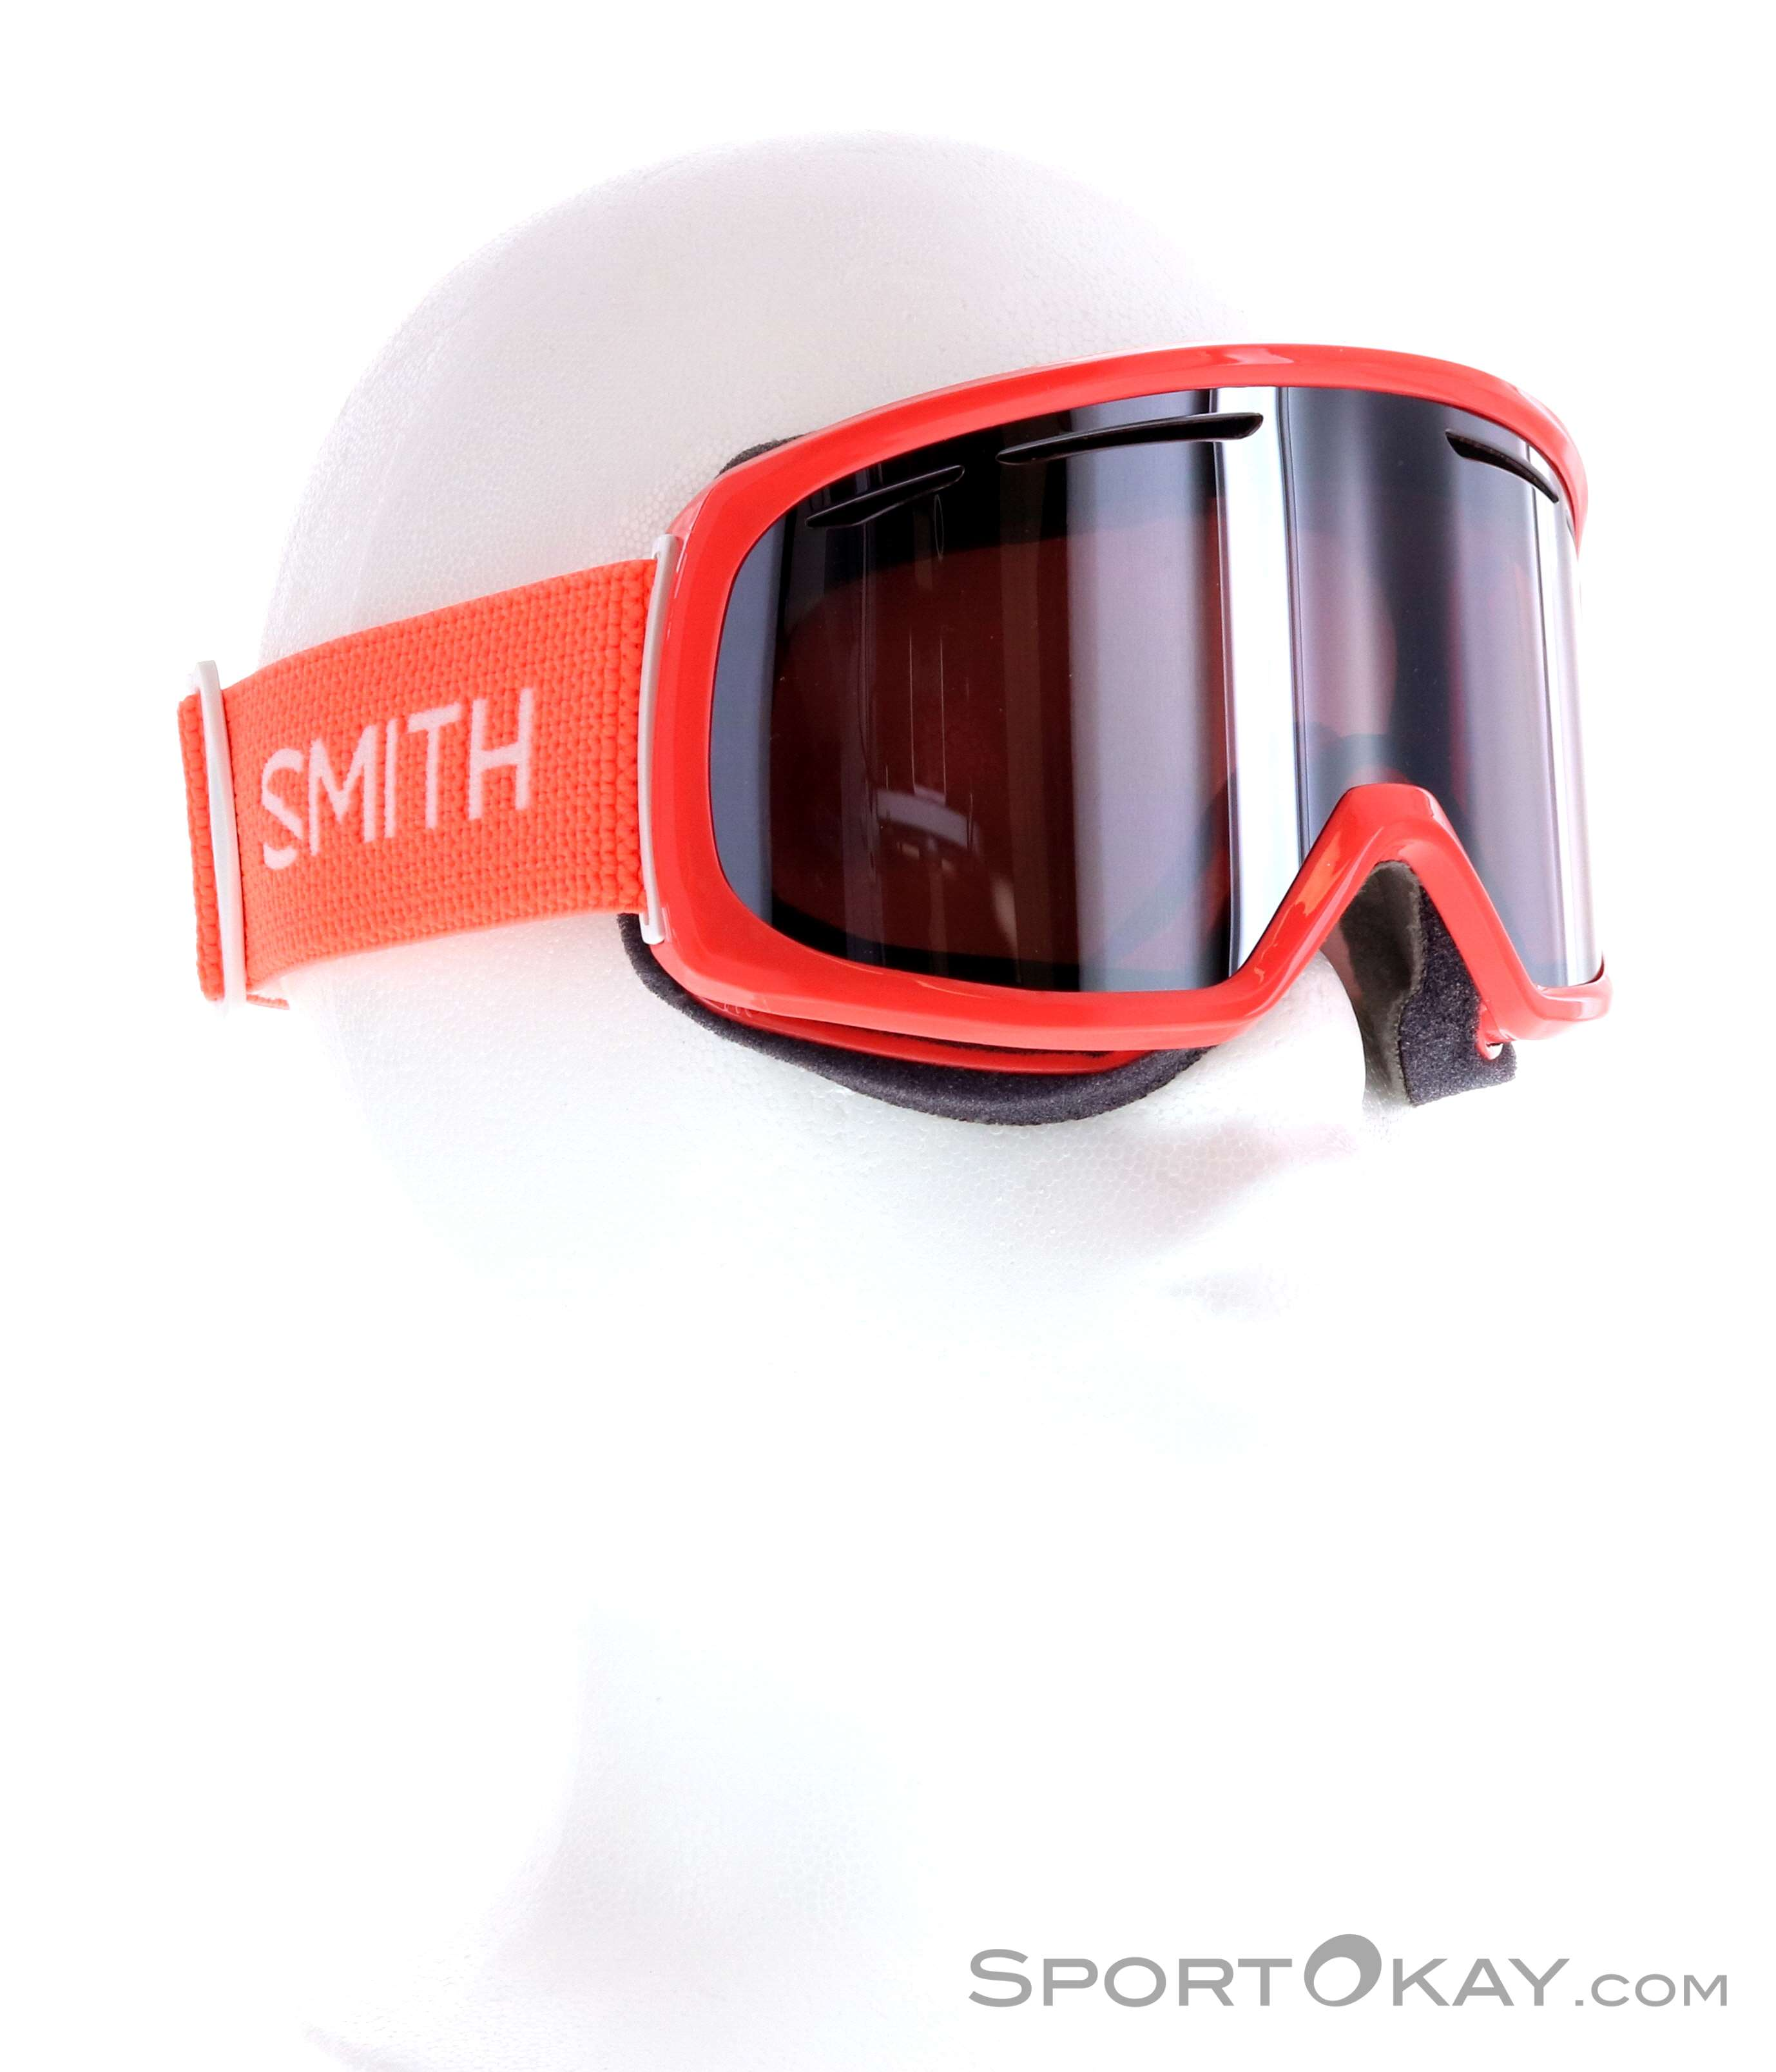 0de06c365ef Smith Drift Ski Goggles - Ski Goggles - Ski Goggles   Accessory ...